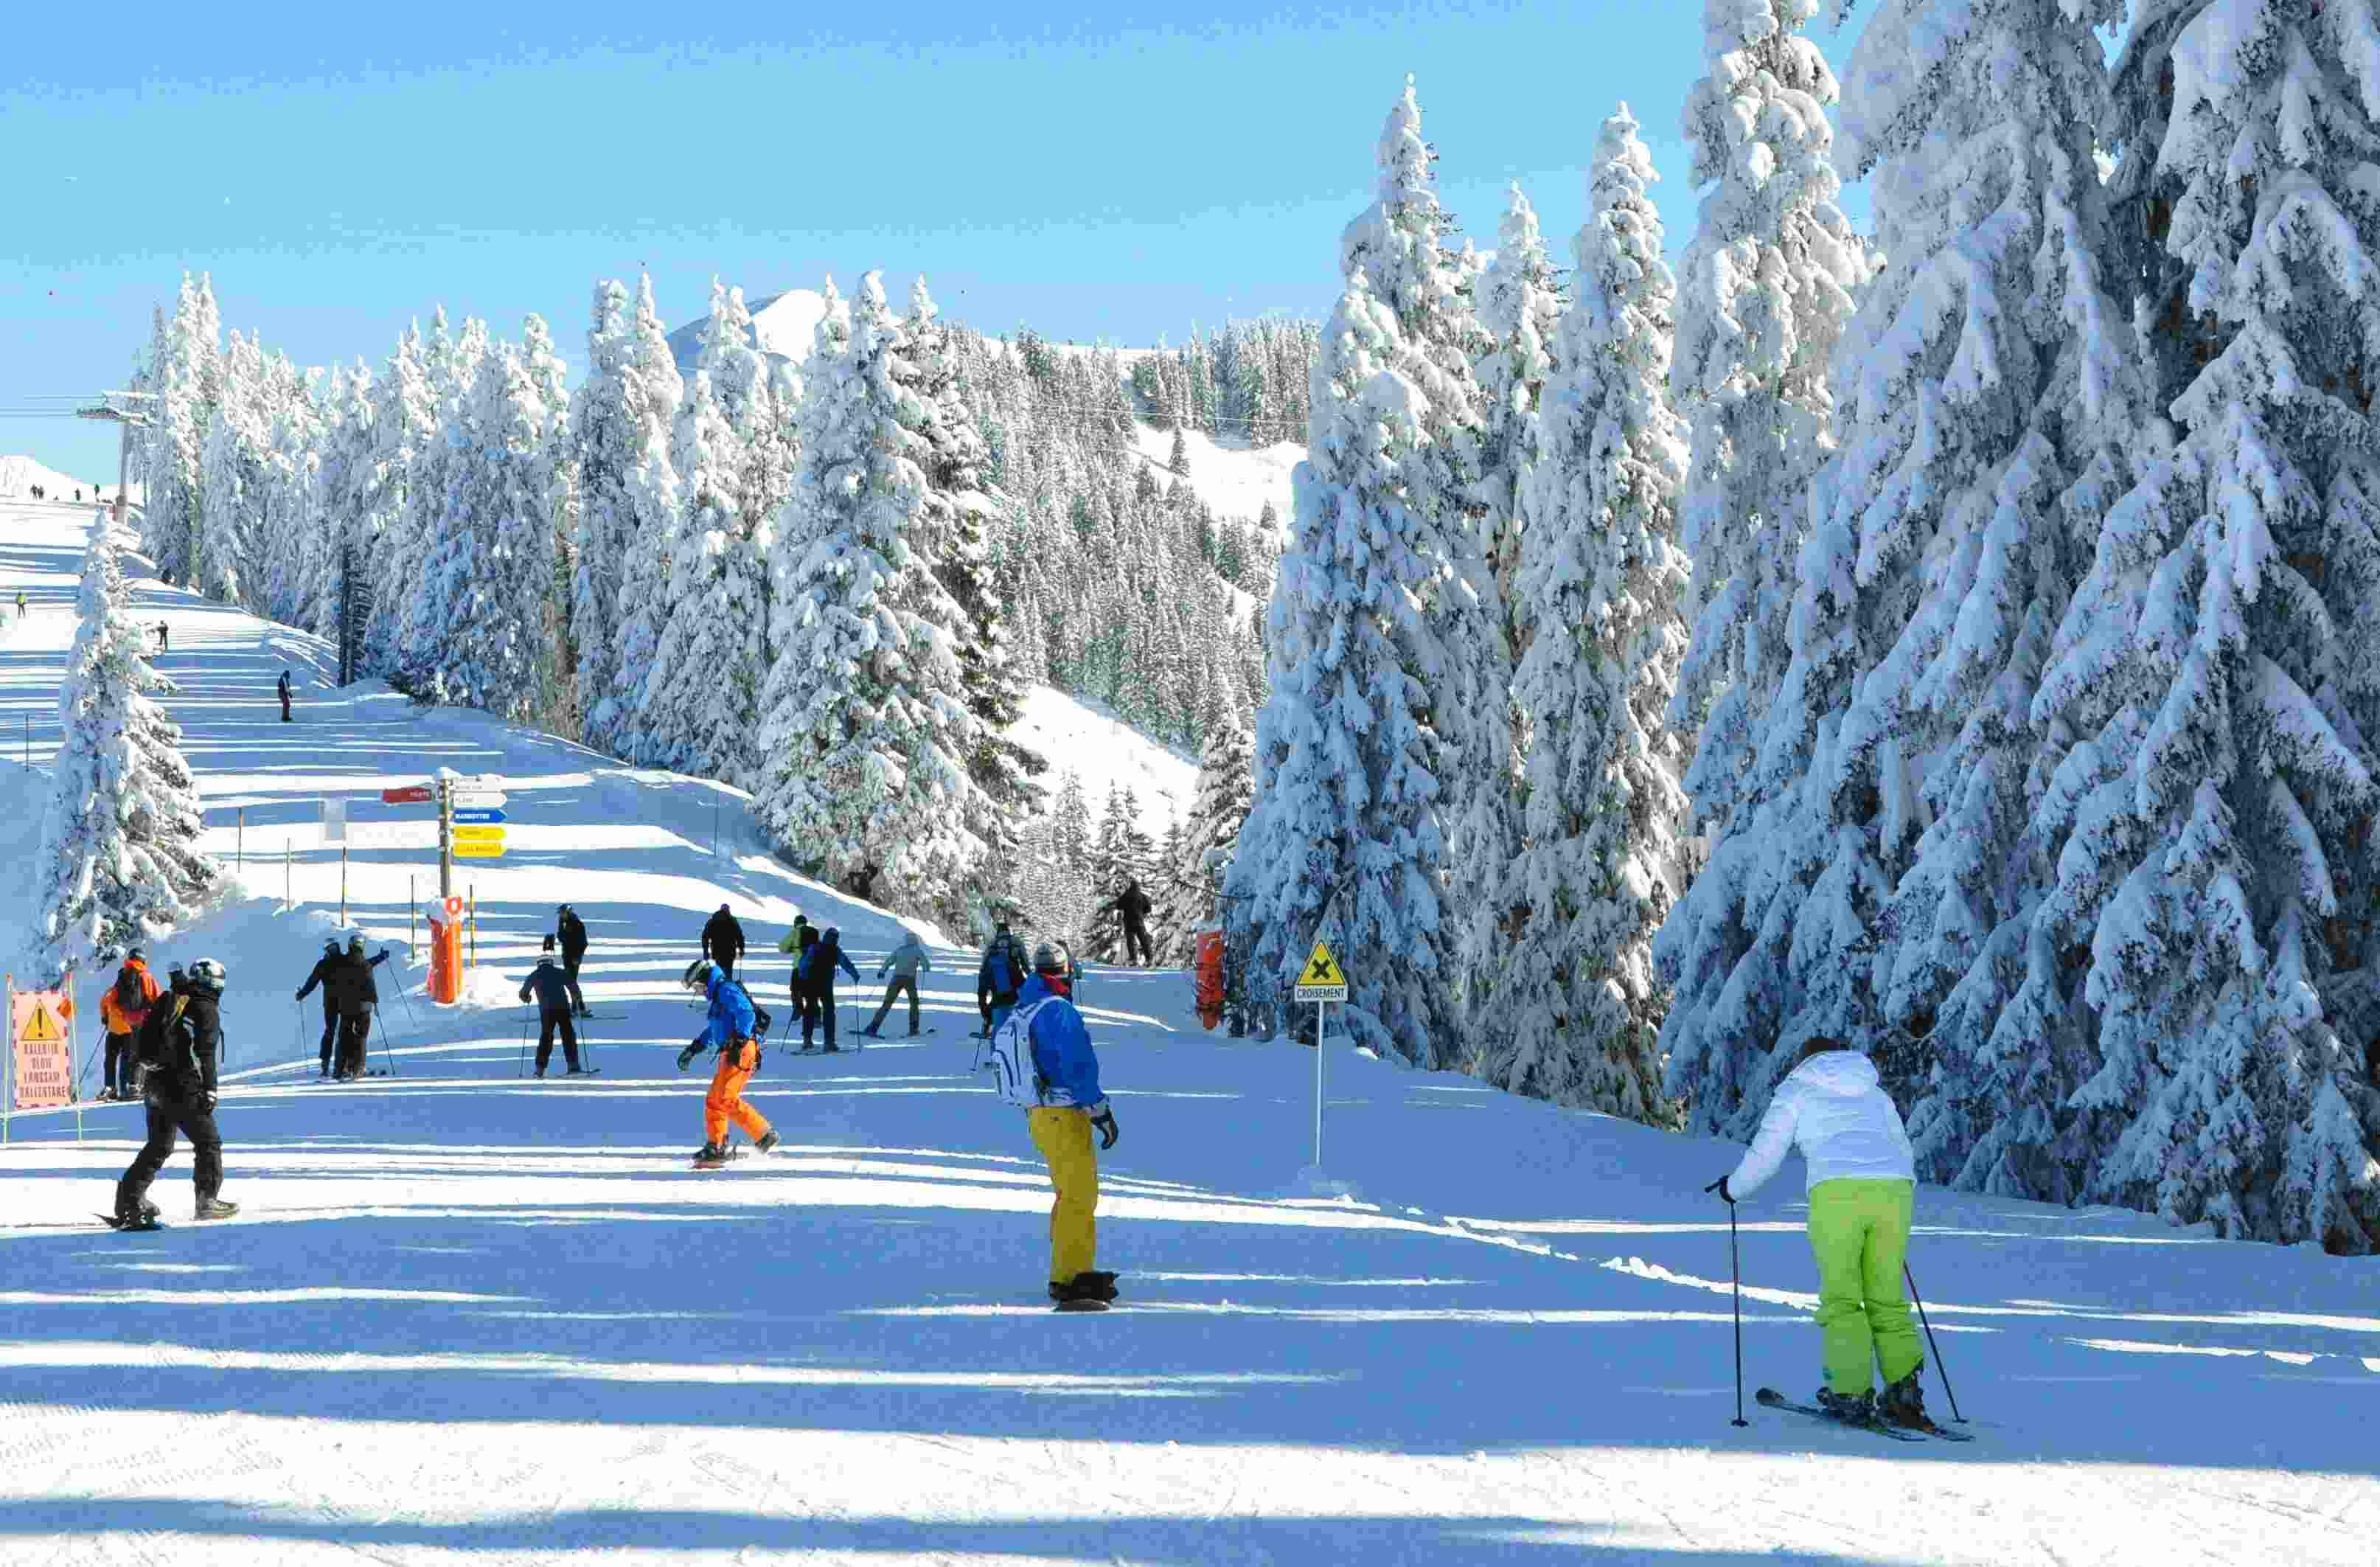 Les Menuires © snowserge-Fotolia.com